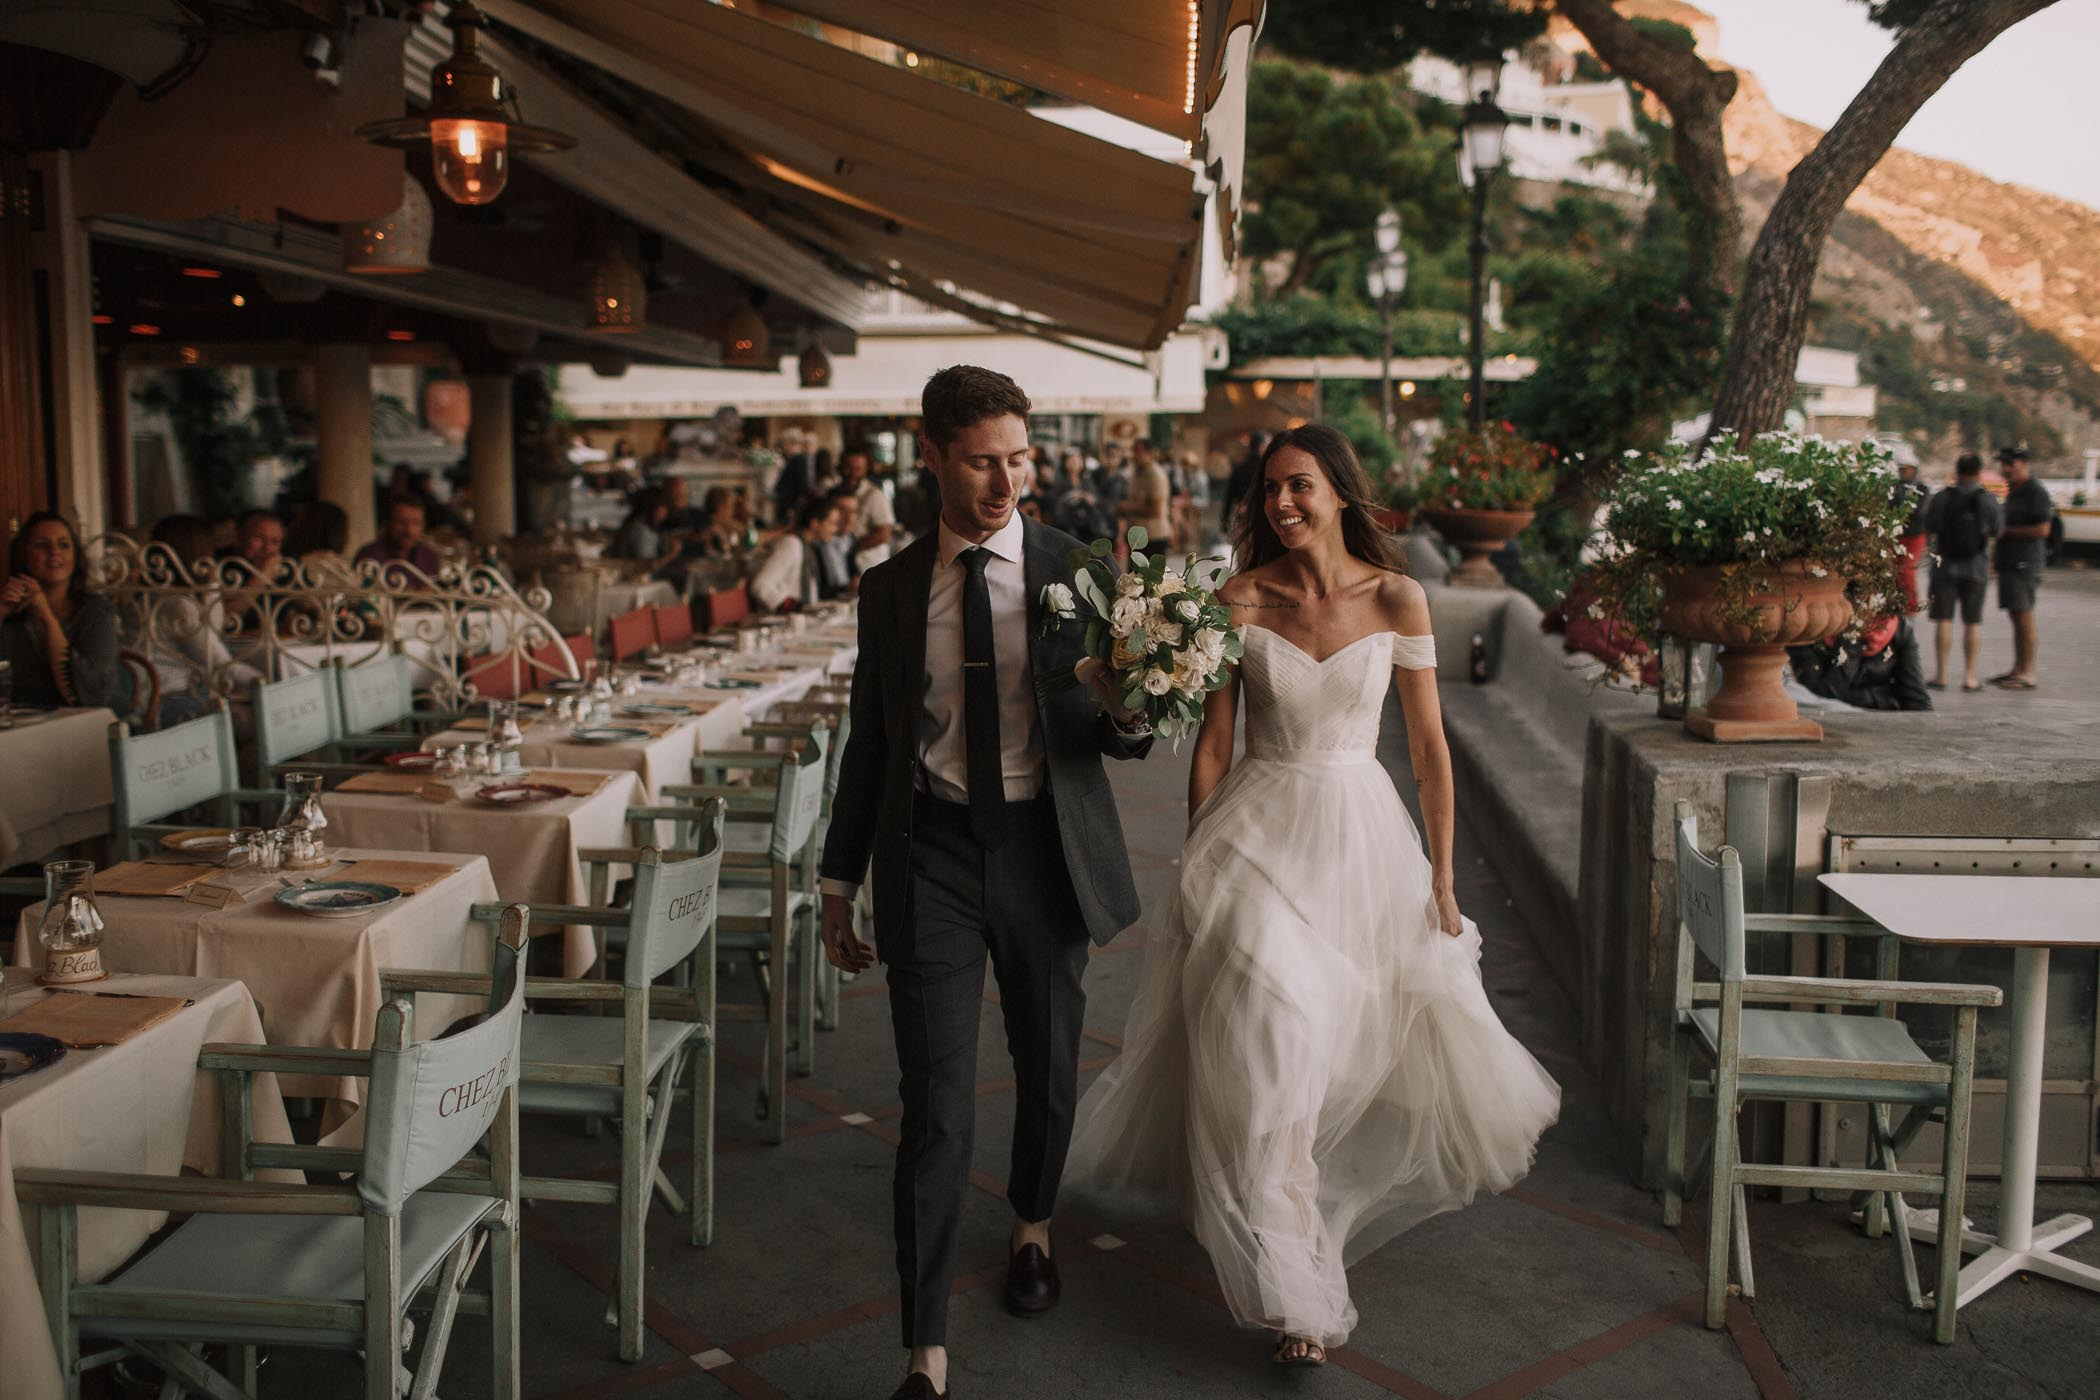 Photographe-mariage-bordeaux-jeremy-boyer-19.jpg